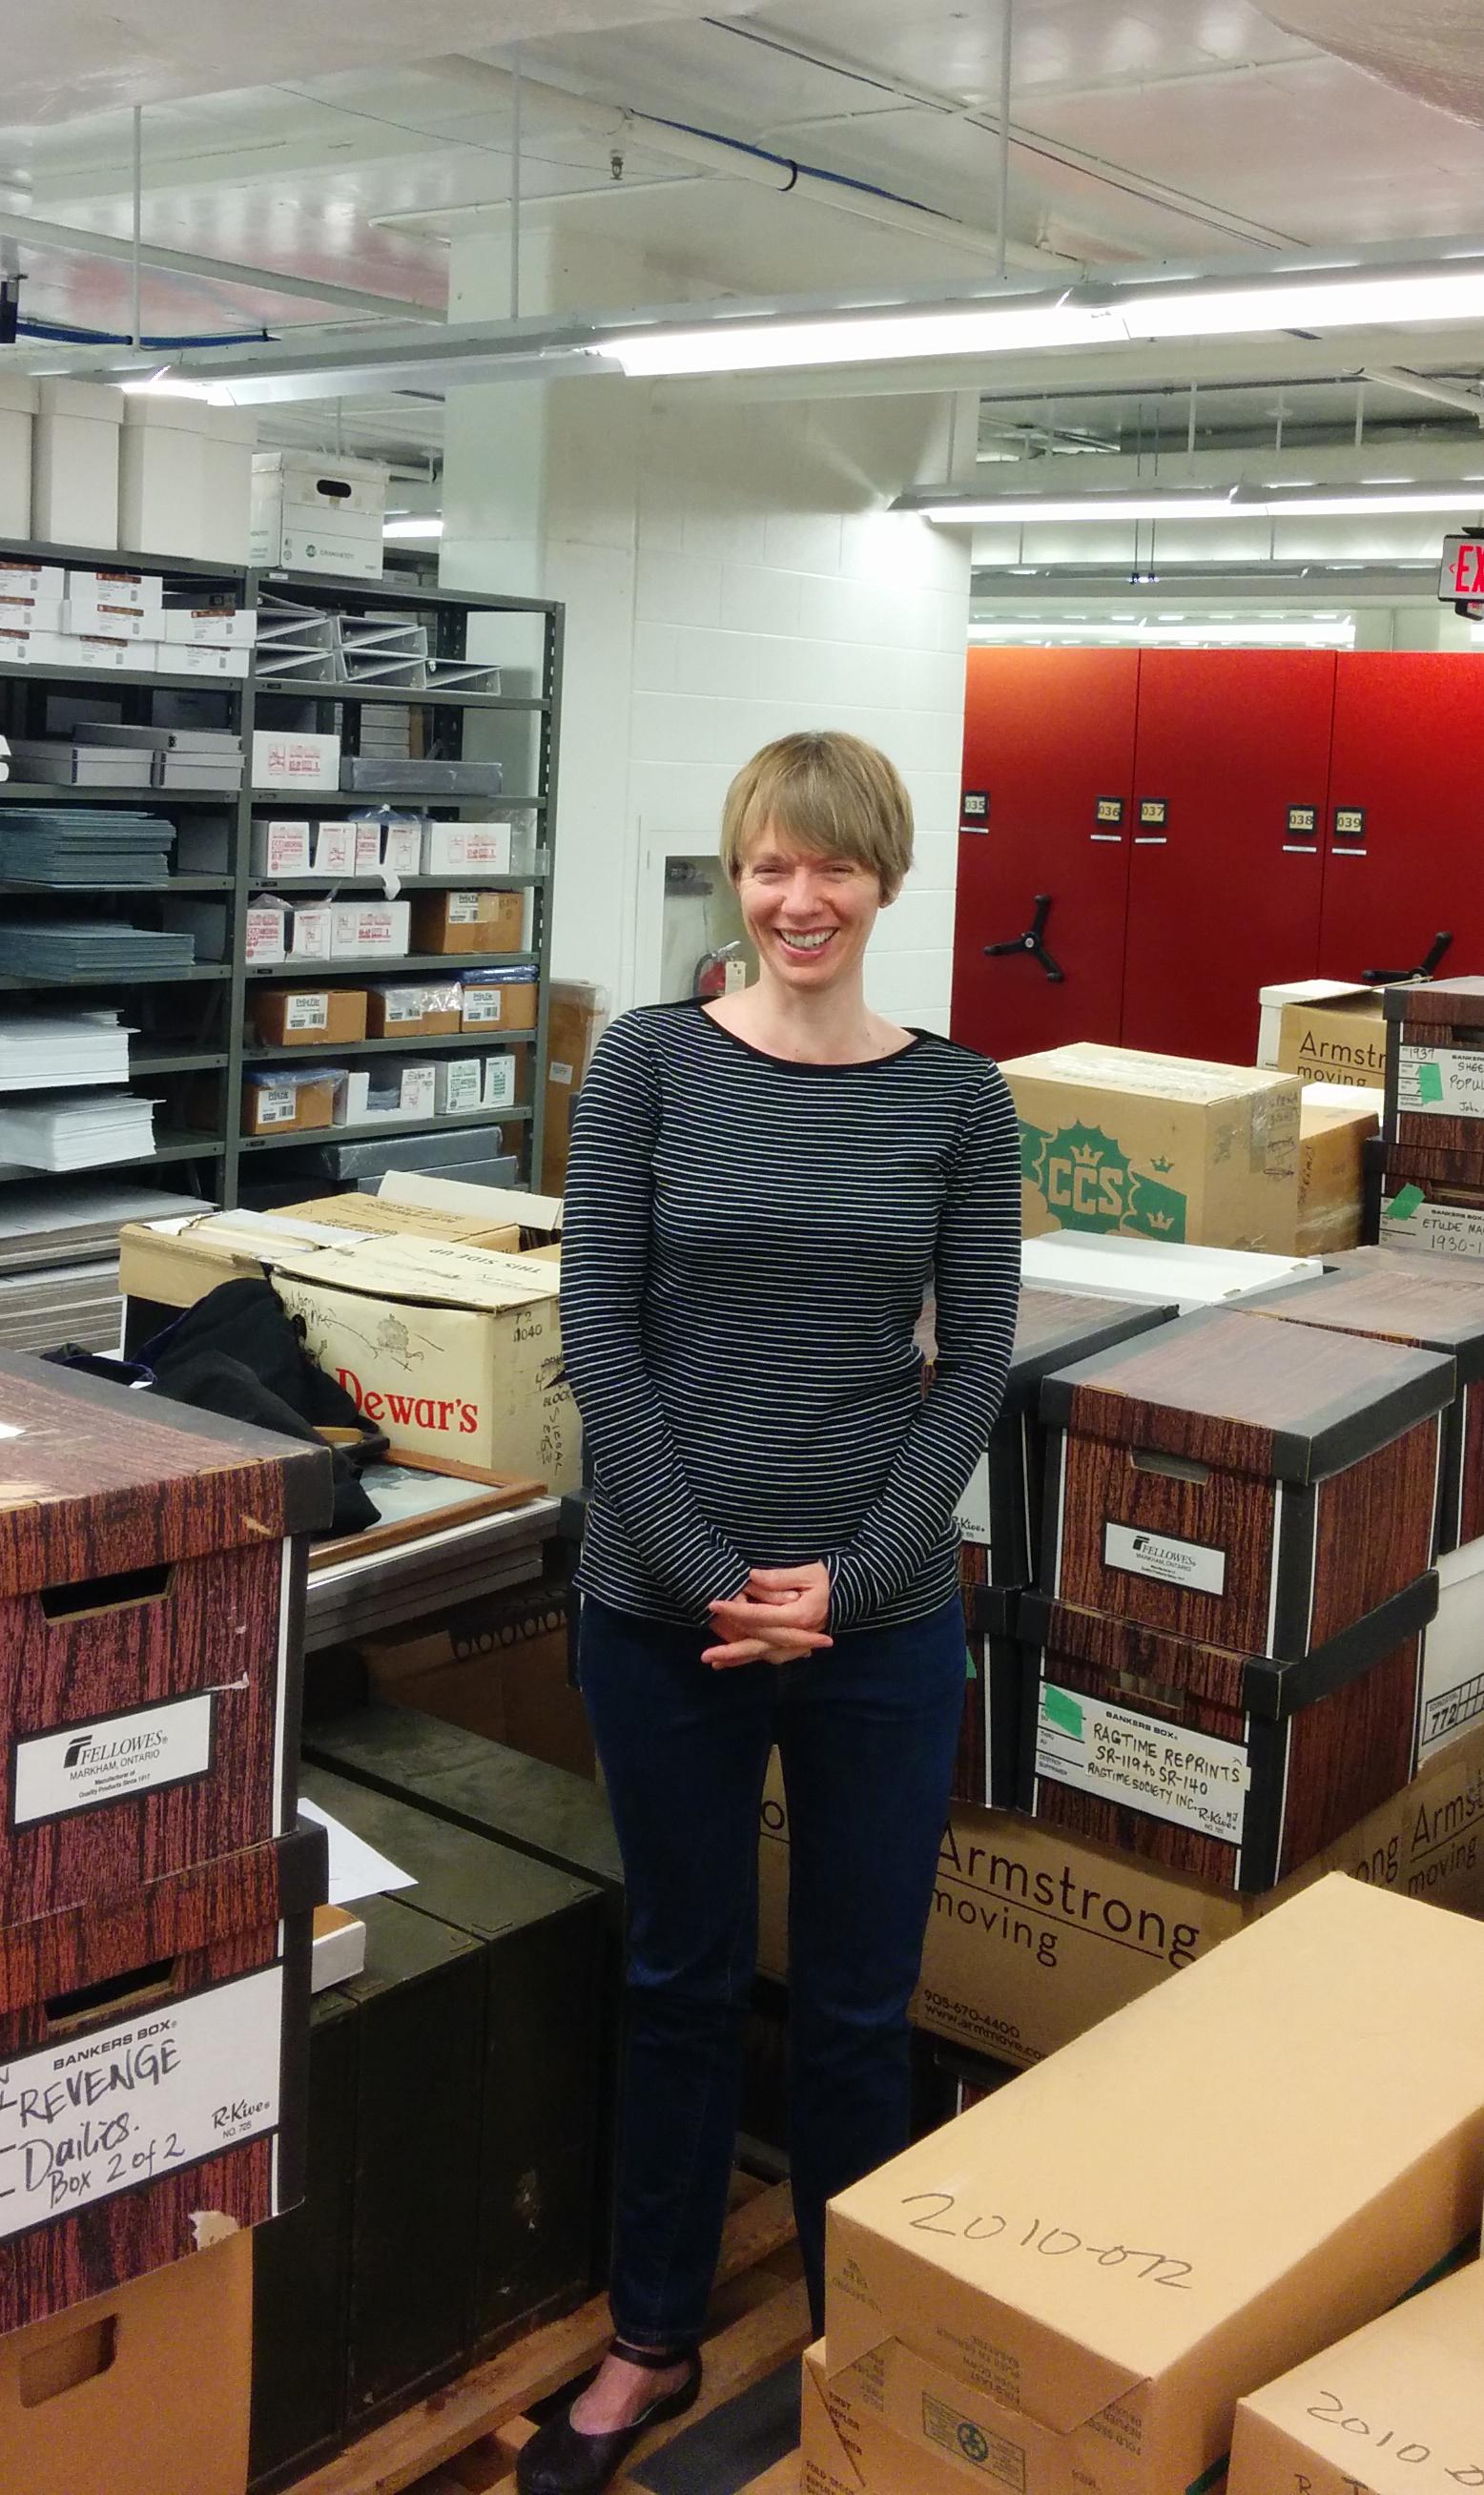 Jennifer Grant, Part-time Archivist